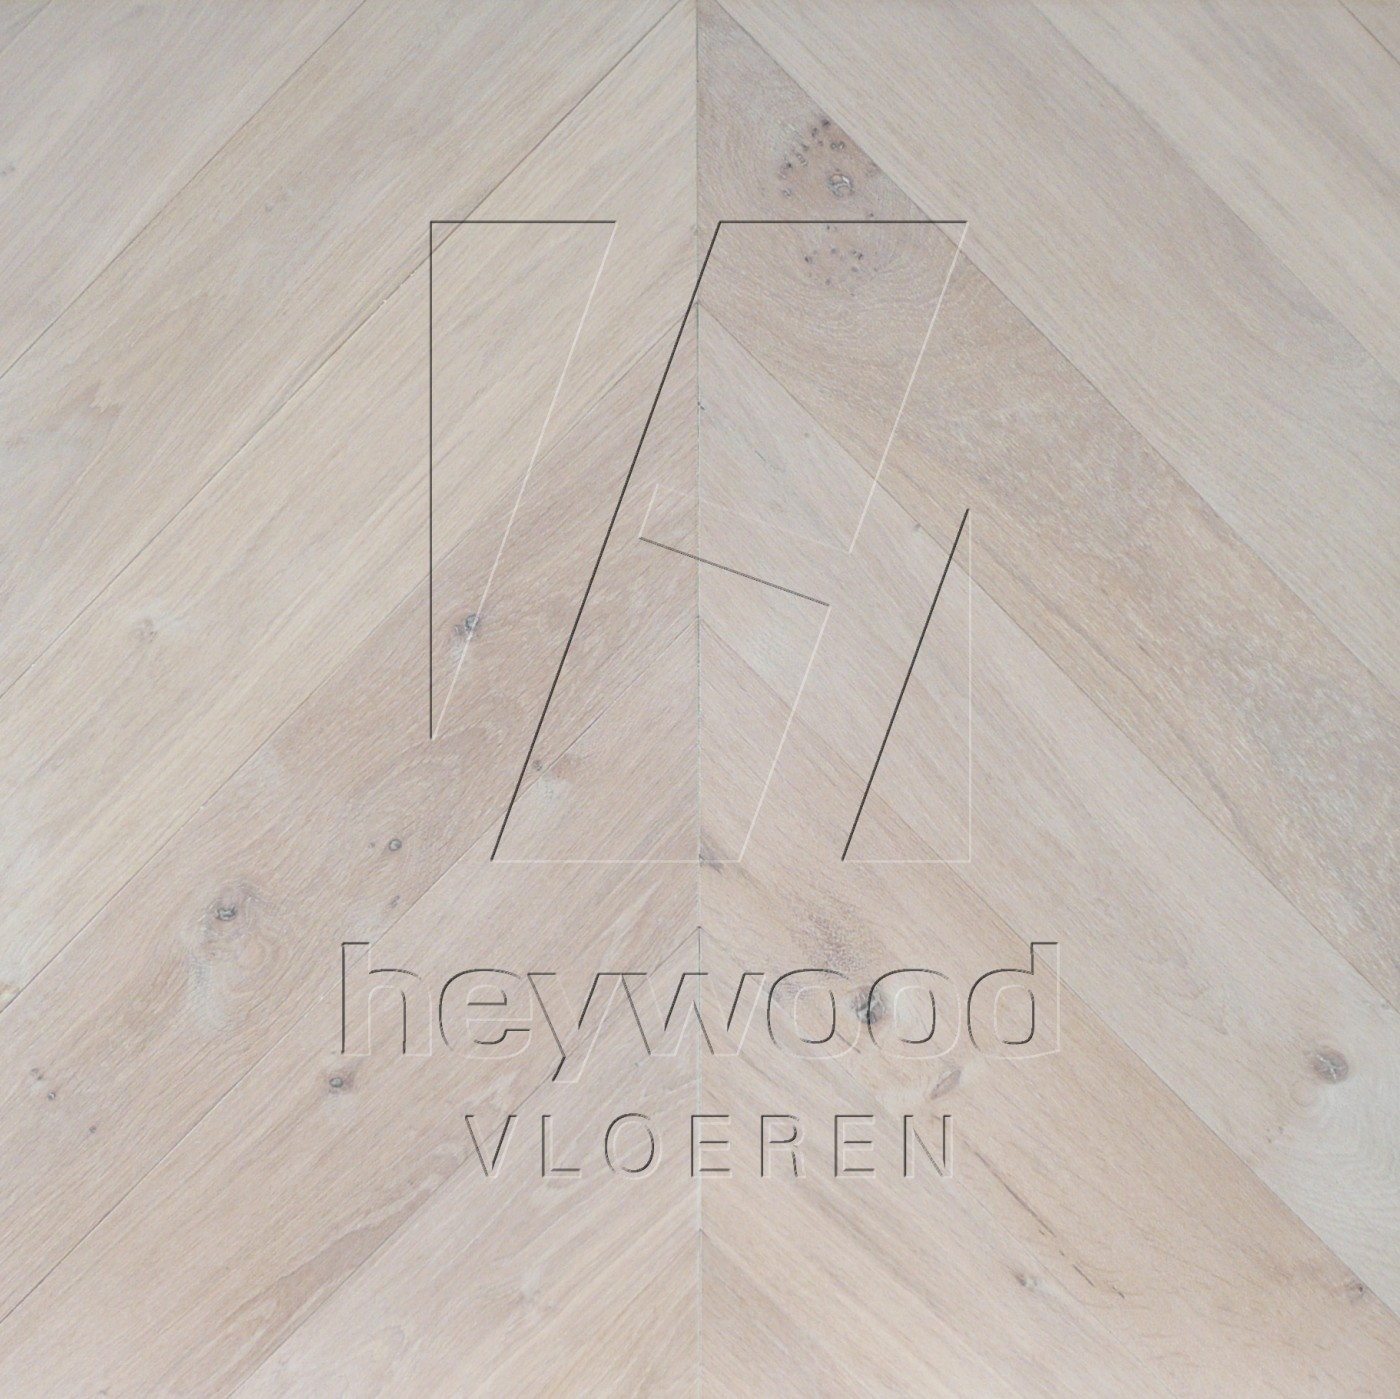 'Nordic White' Chevron 45°, Bespoke Character in Chevron of Pattern & Panel Floors